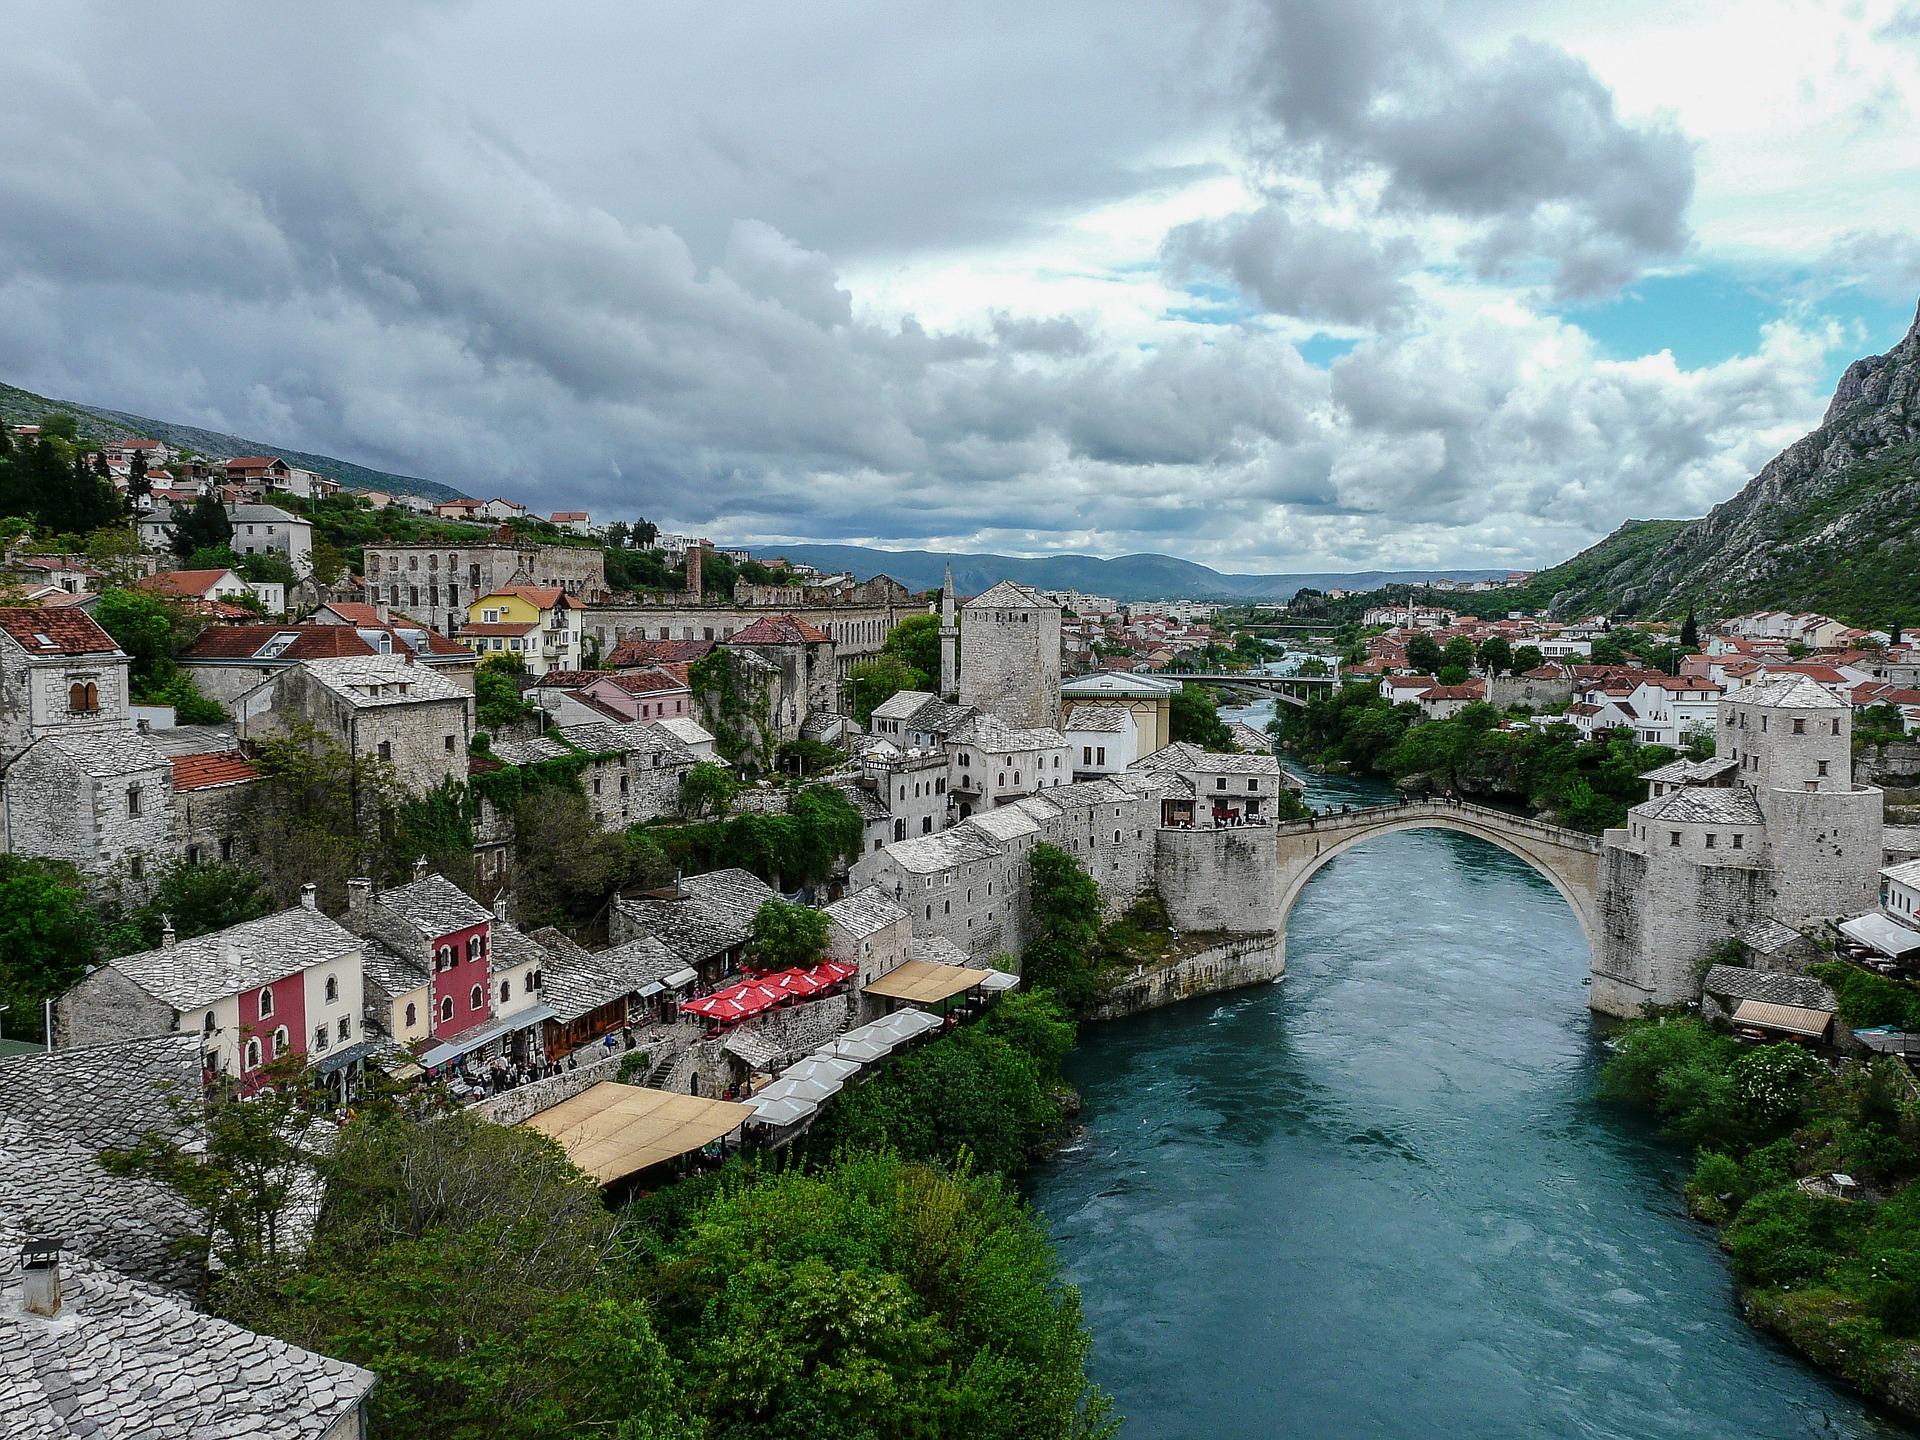 Mostar – dragulj ob reki Neretvi